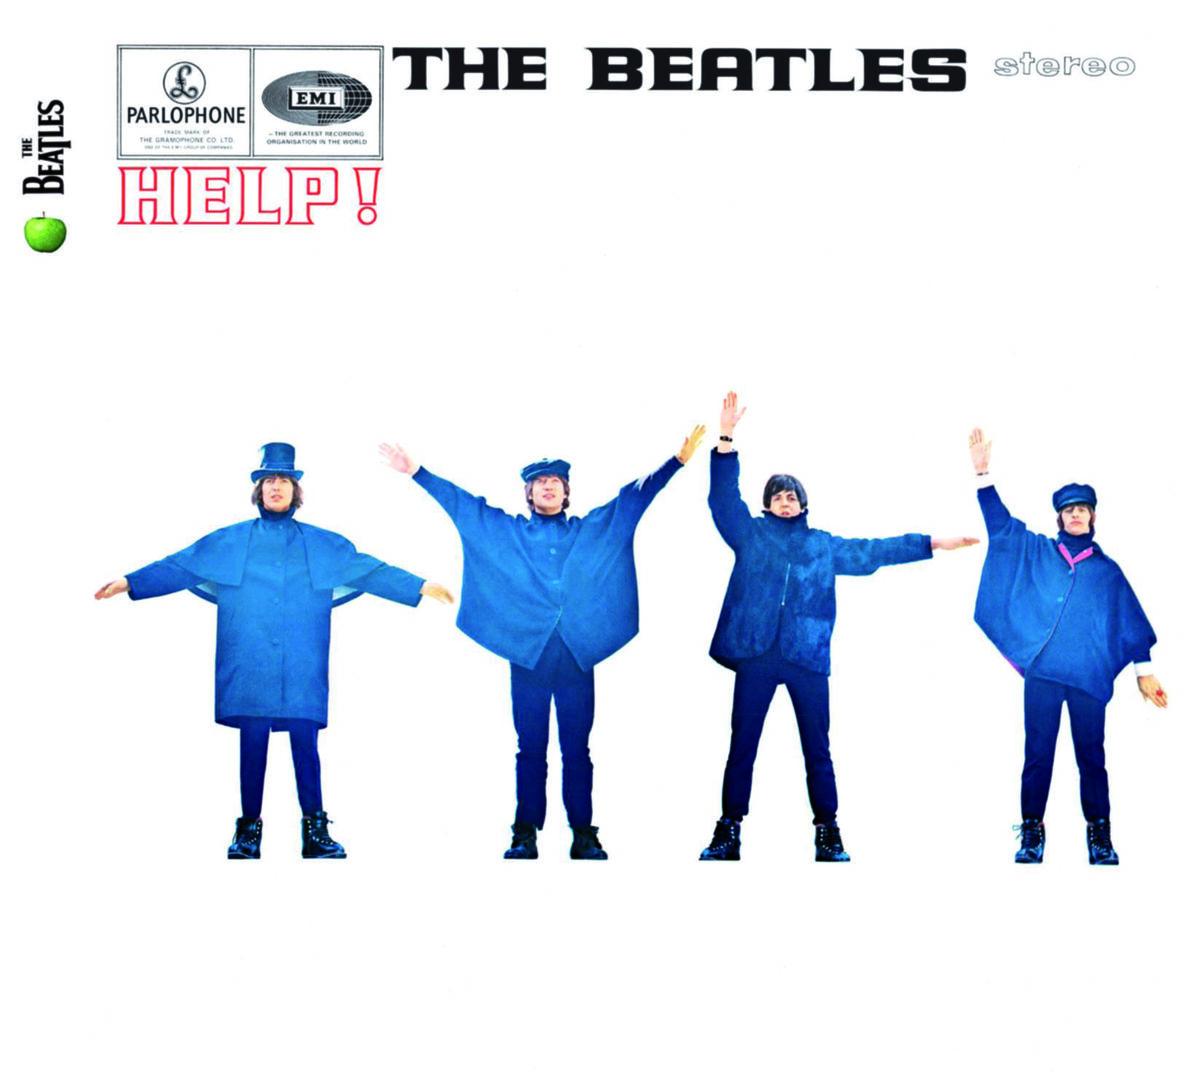 The Beatles: Help! (GB 965)